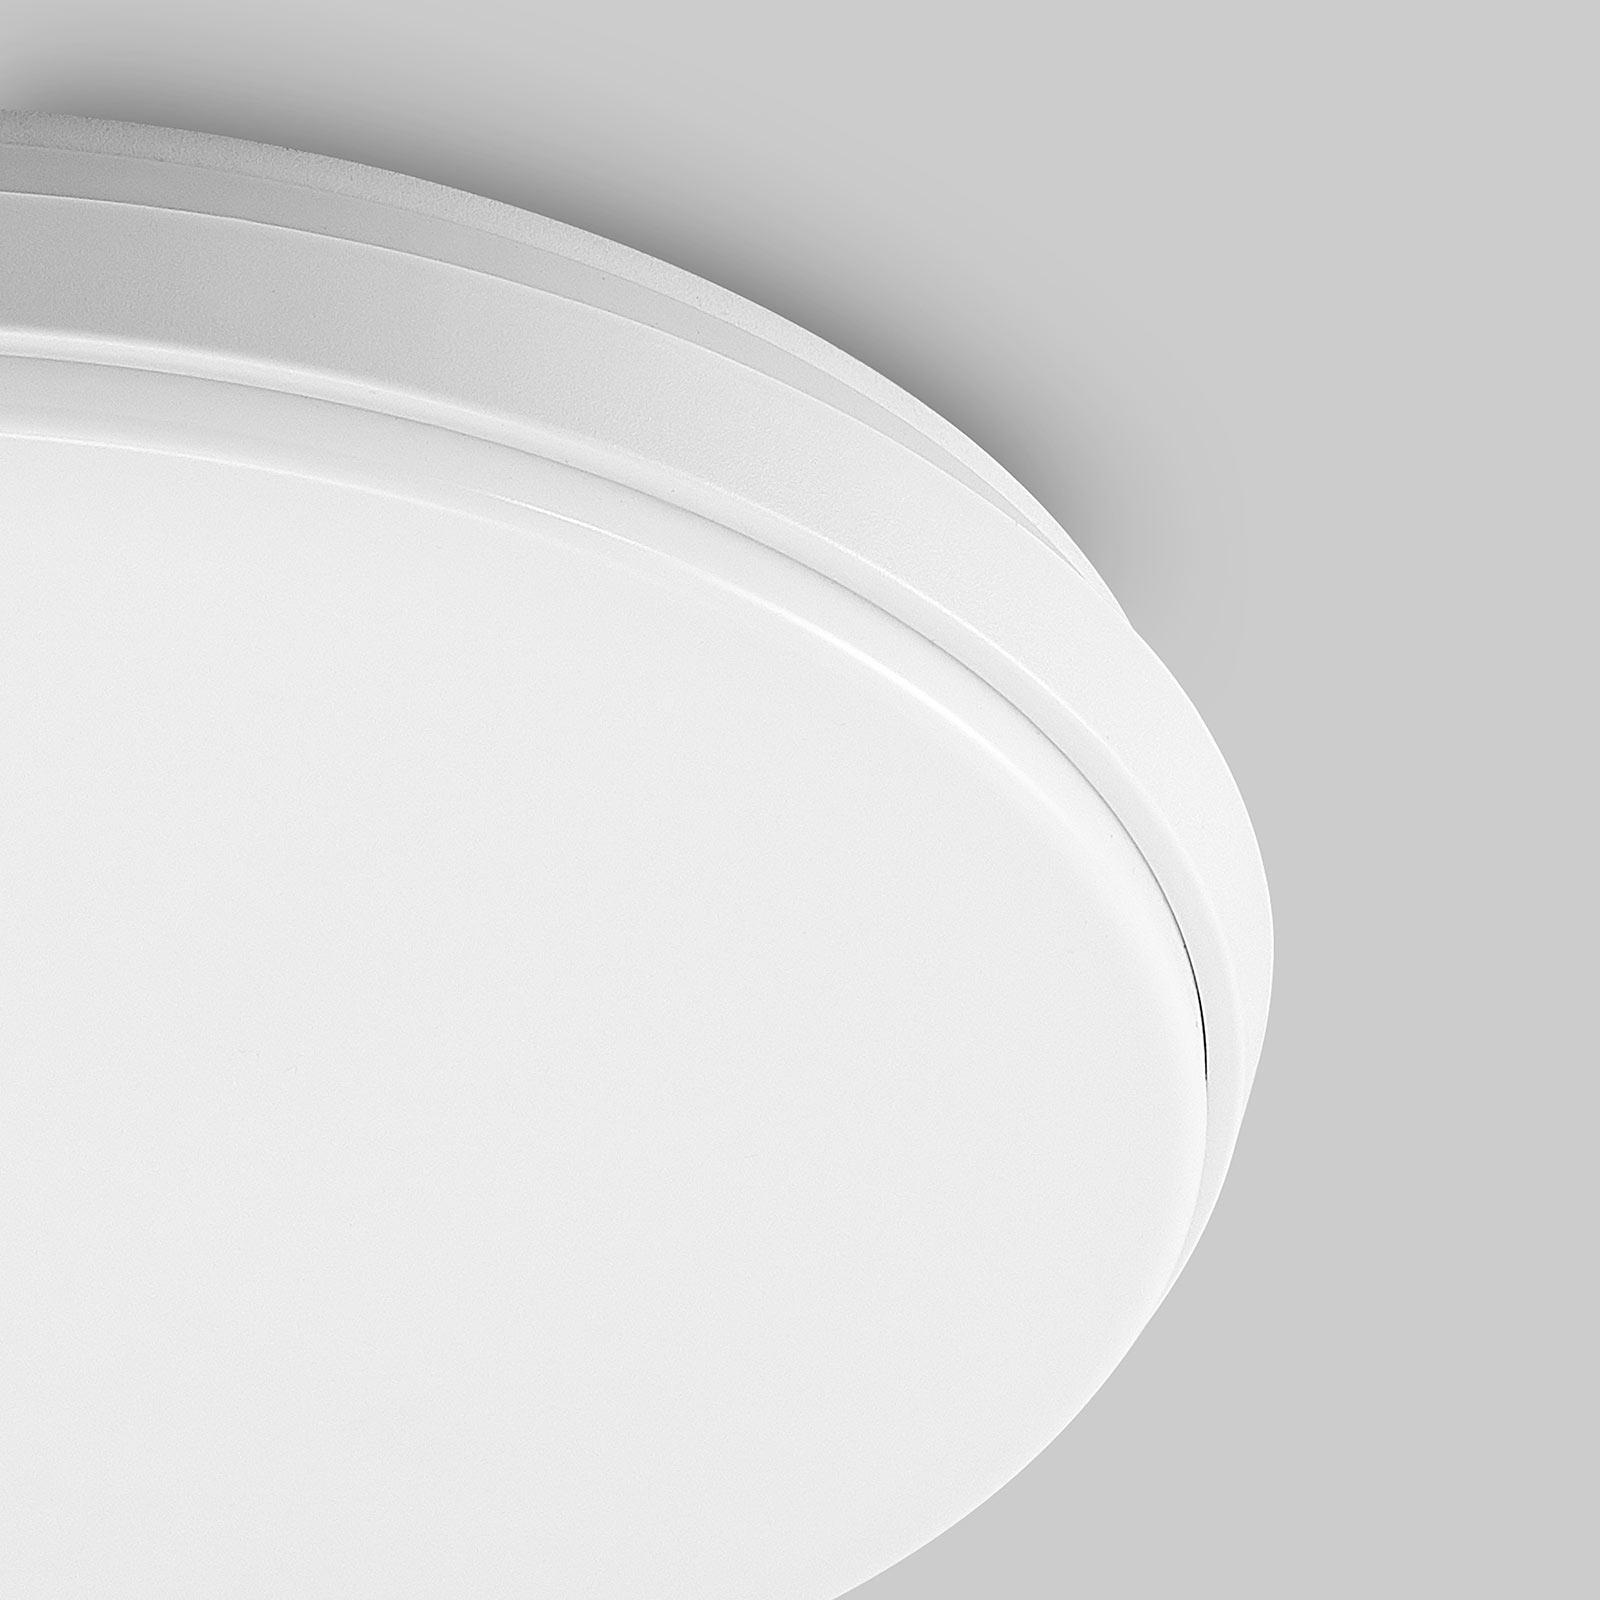 Arcchio Brady LED plafondlamp, wit, rond, 40 cm